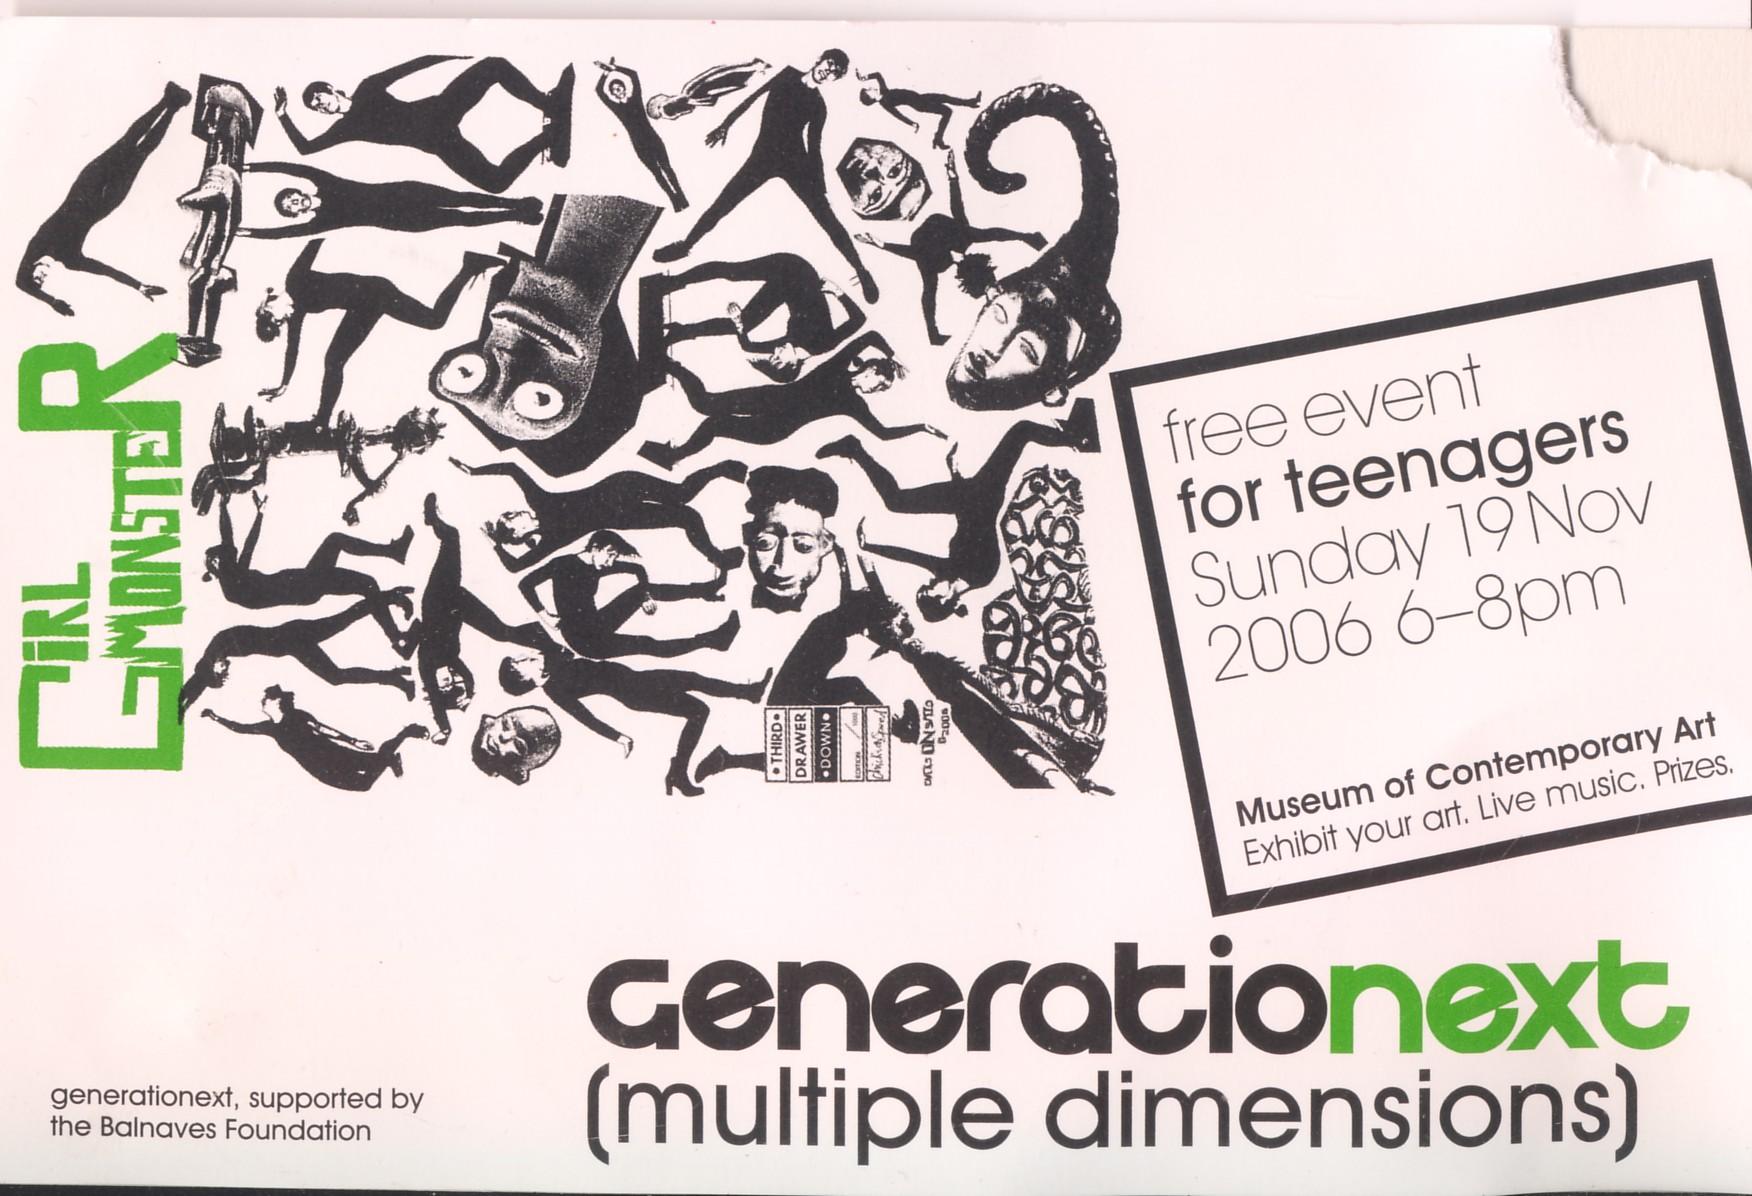 Generationext: 19 Nov 2006